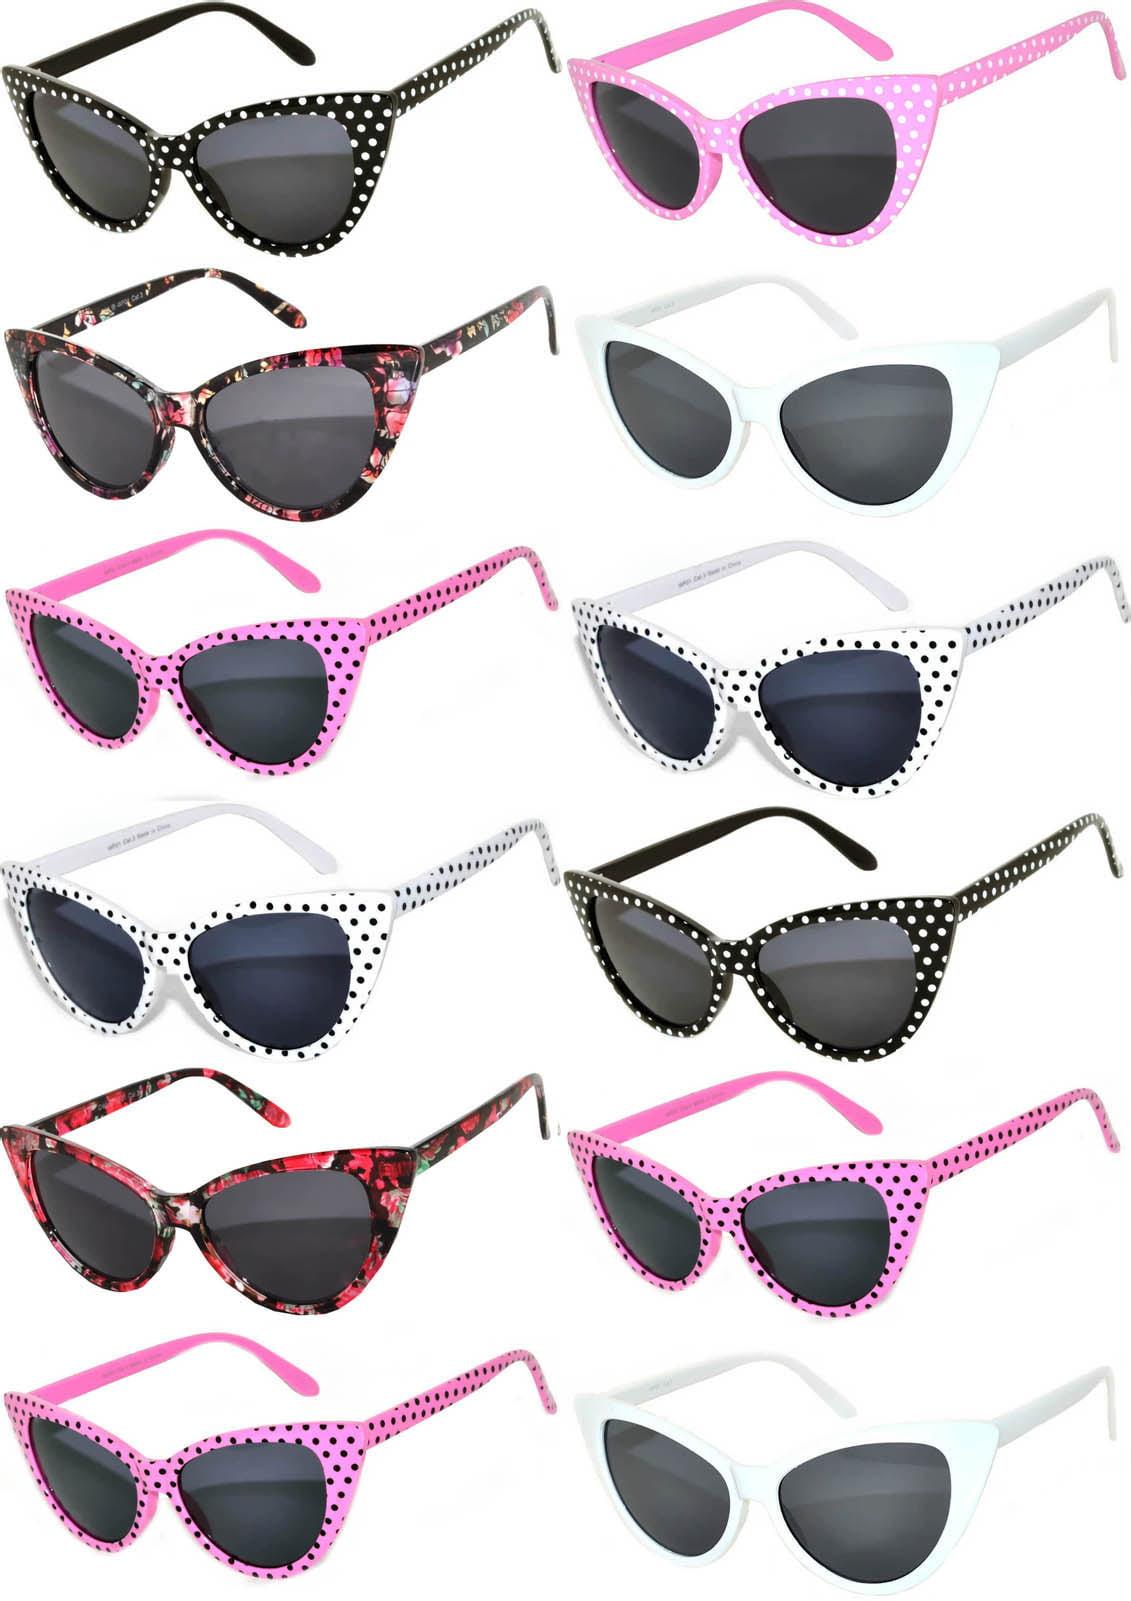 Retro Women's Cat Eye Vintage Sunglasses UV Protection Colored Frame Colored Lens Brand OWL (12 Pack)